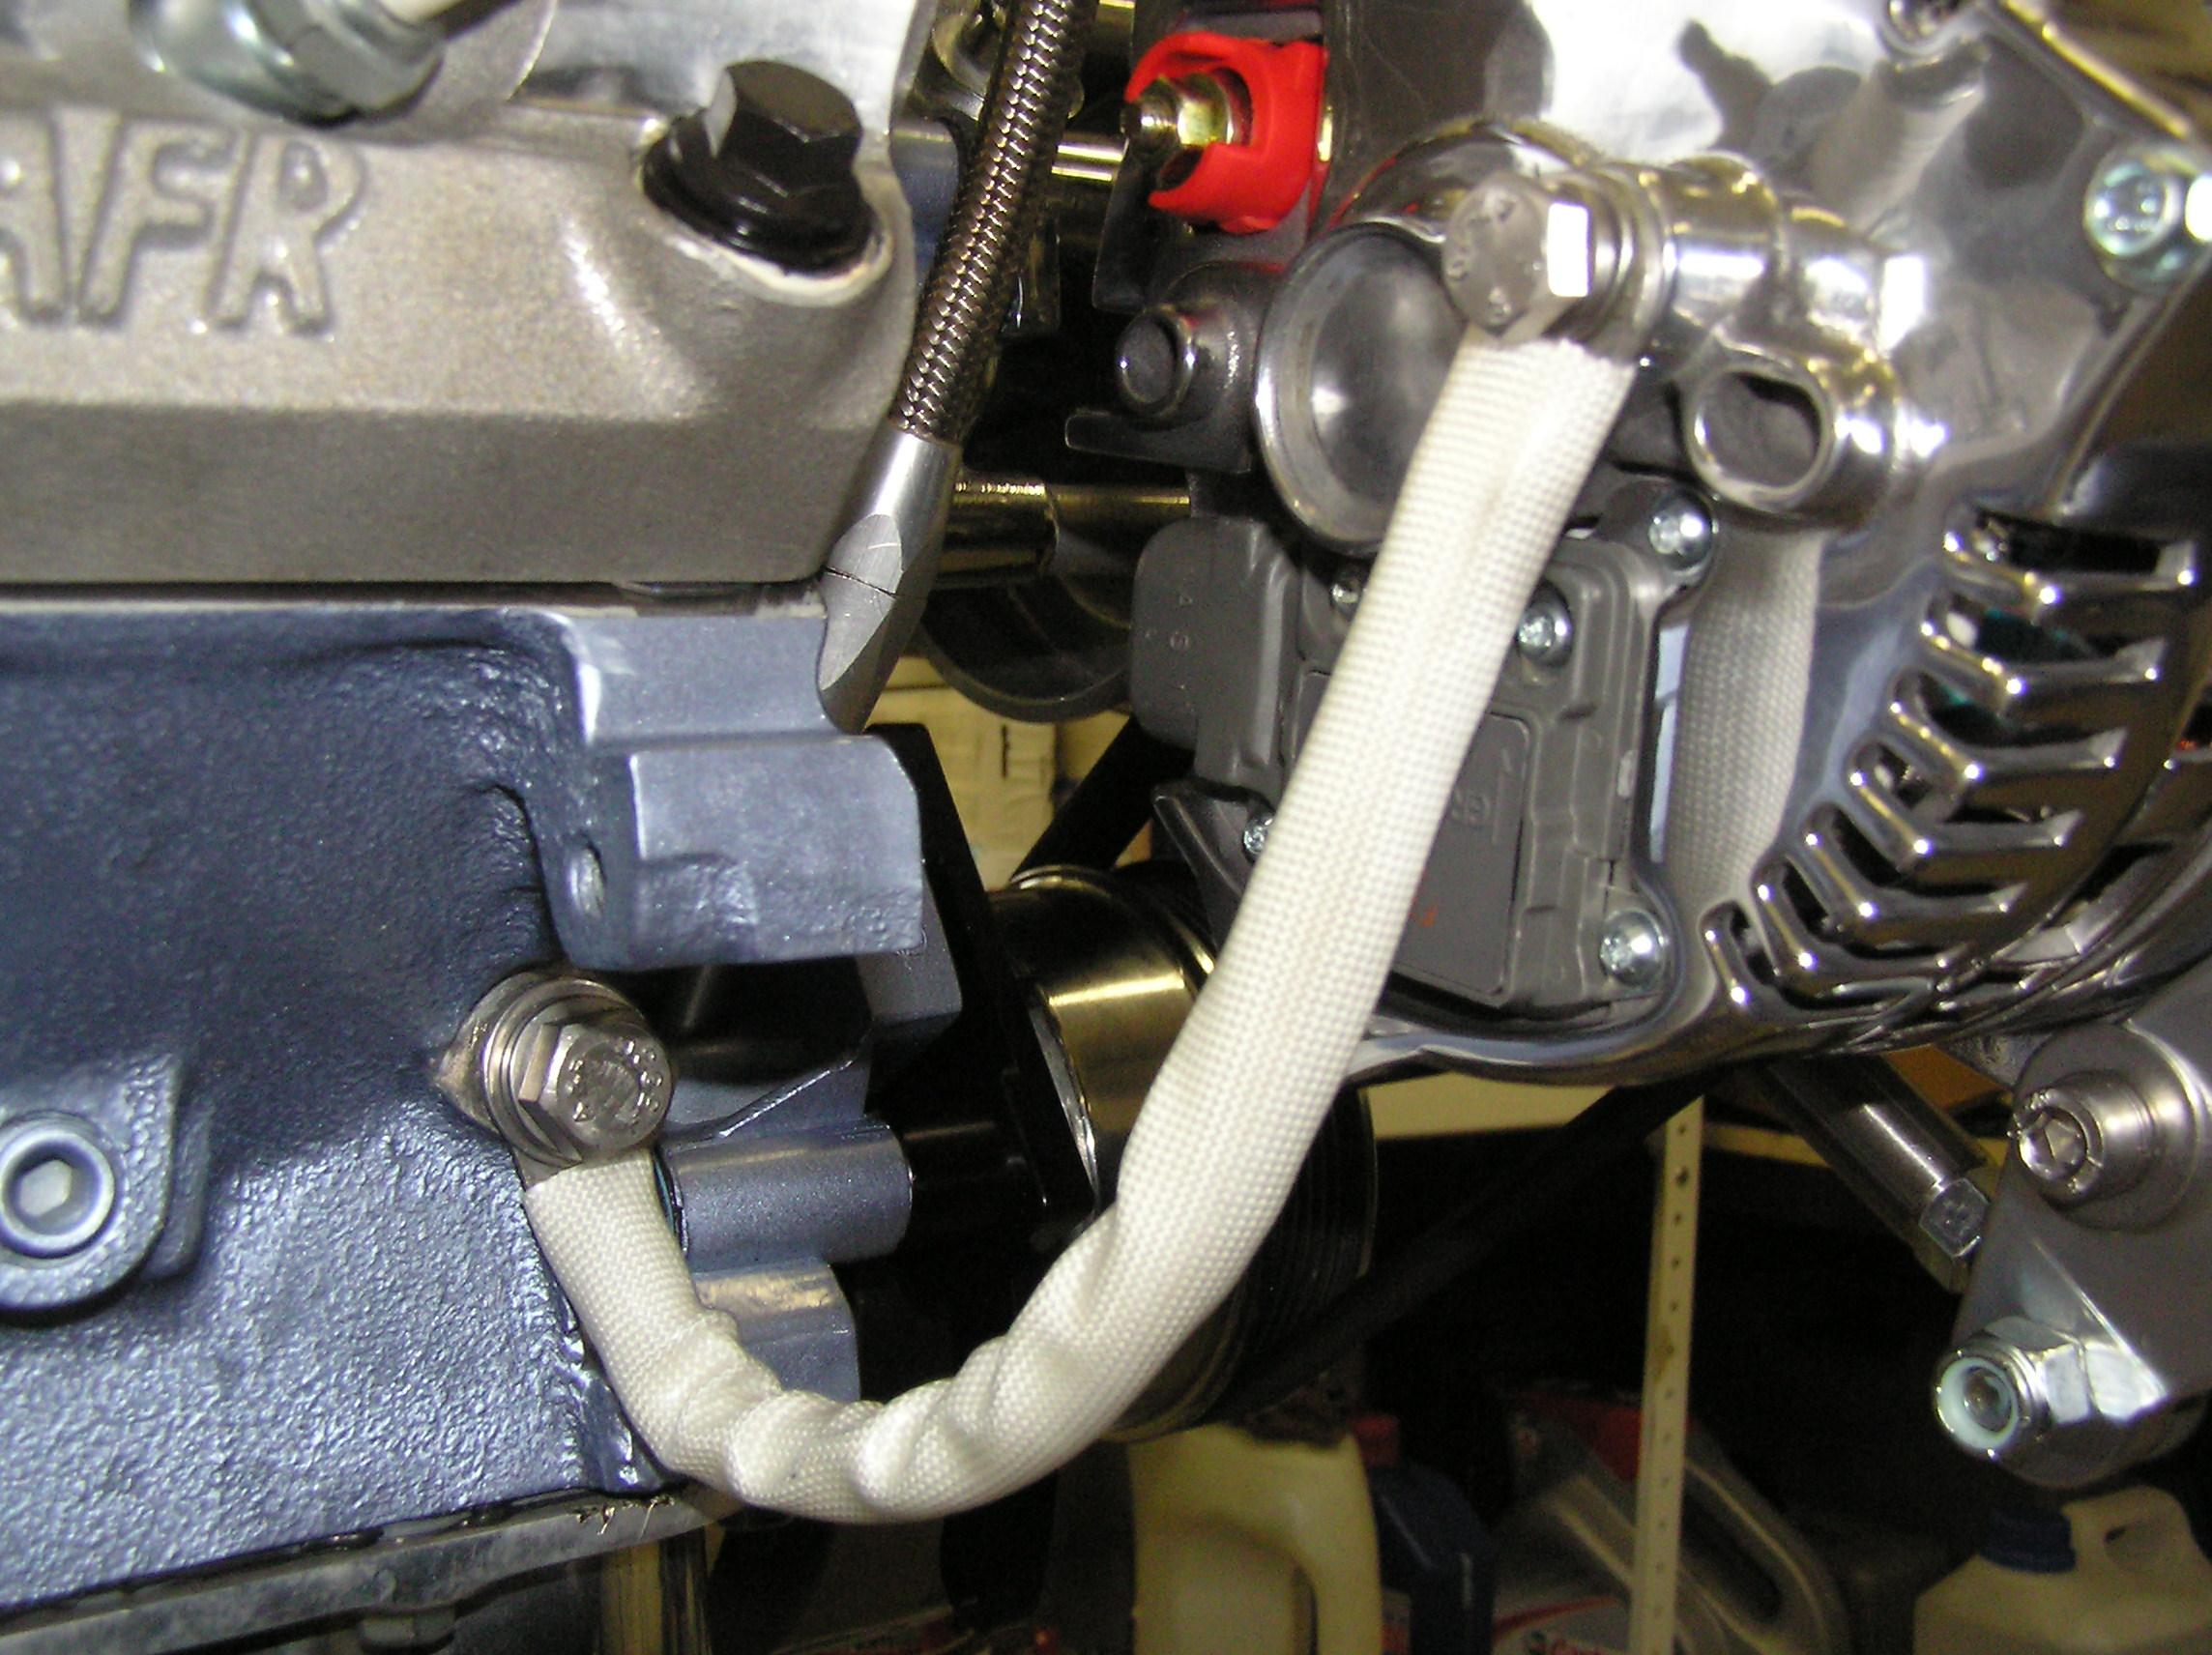 Fantastisch 1967 Ford Mustang Lichtmaschine Schaltplan Ideen ...